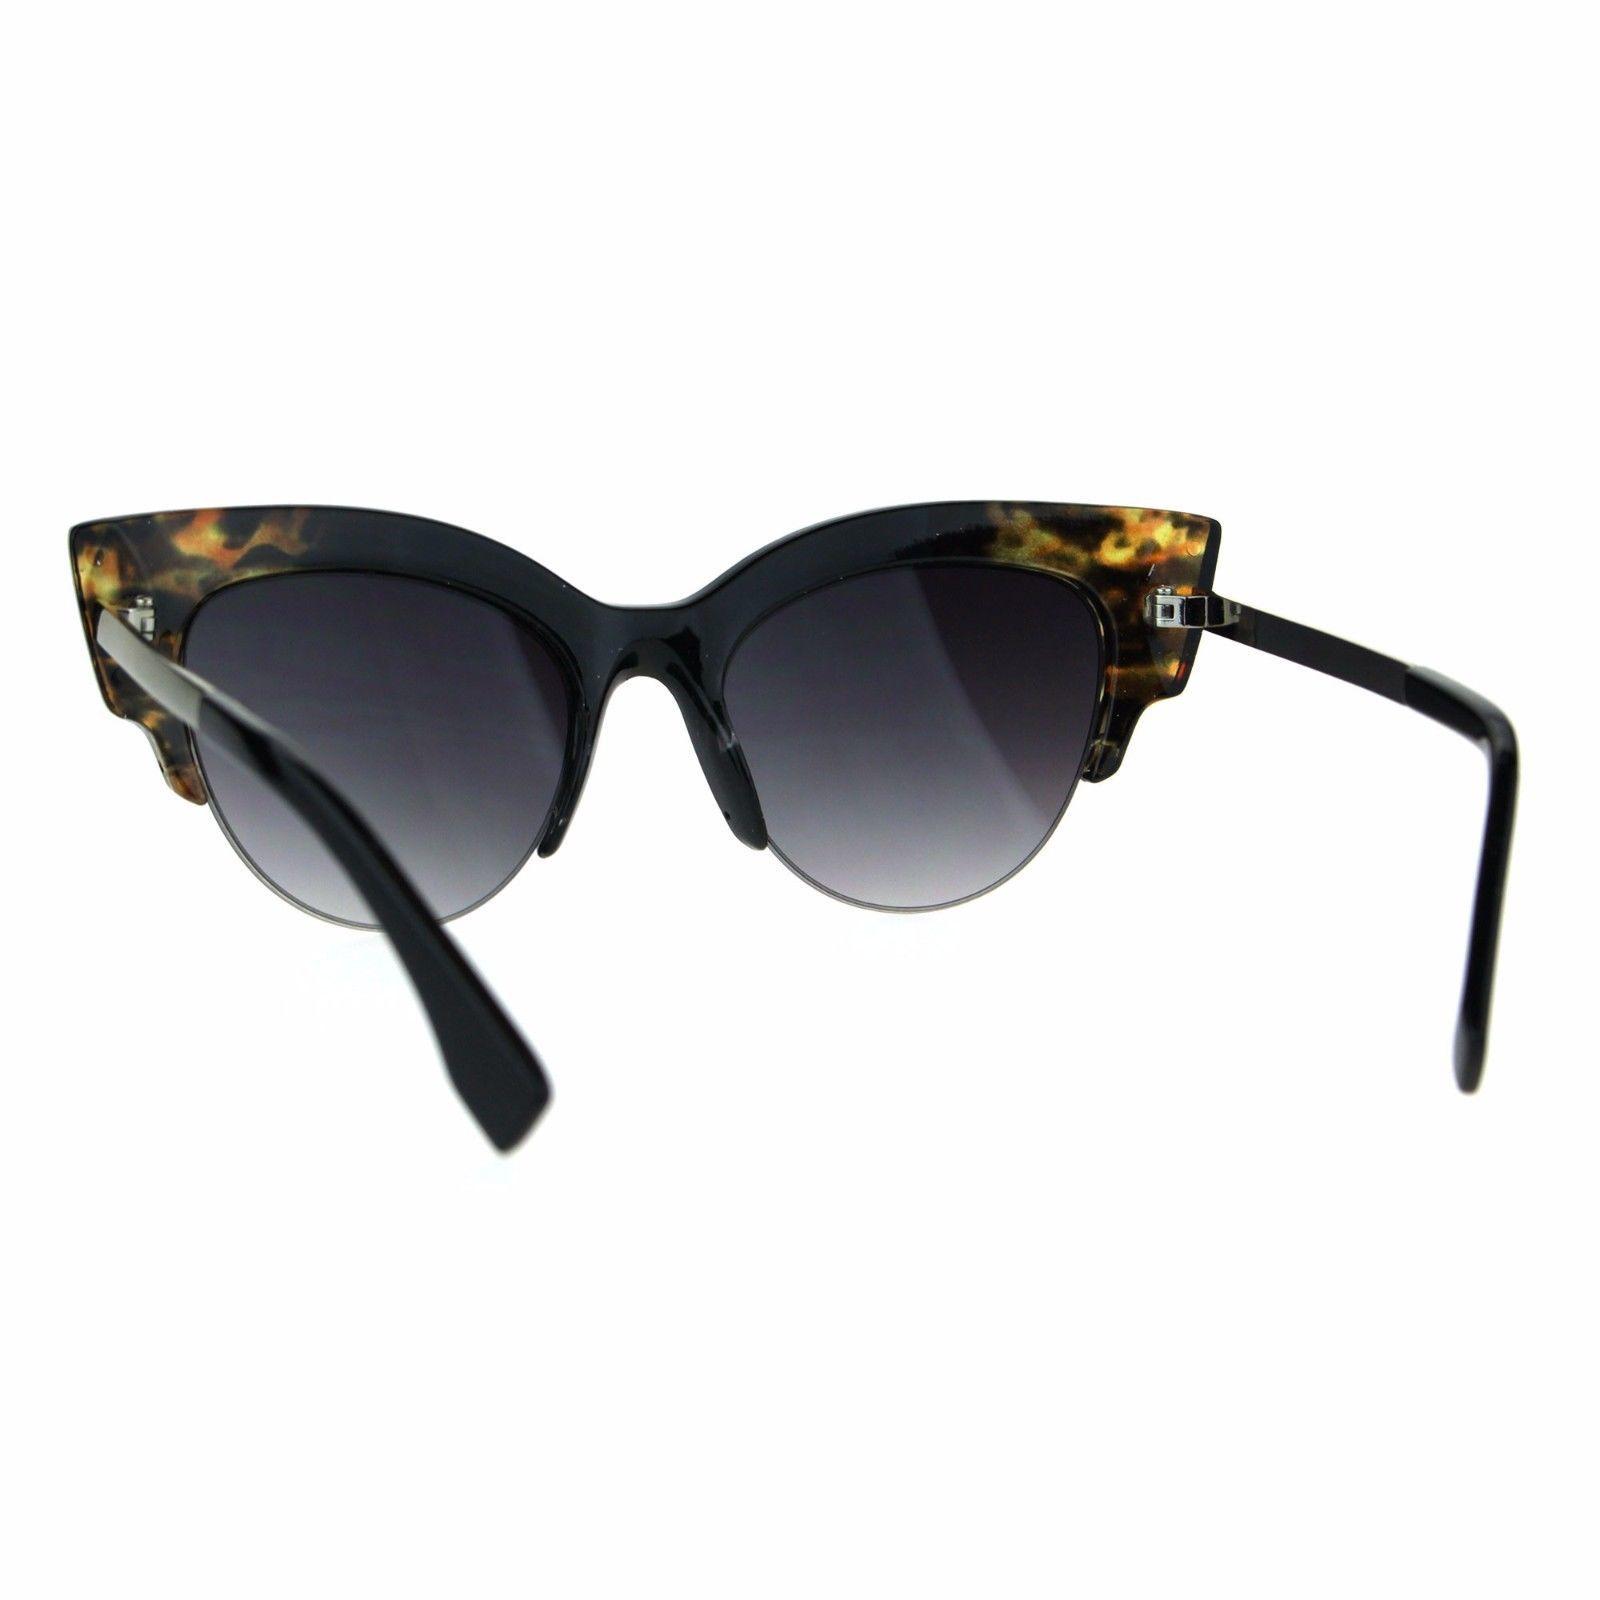 Womens Stylish Sunglasses Half Rim Cateye Fashion Shades UV 400